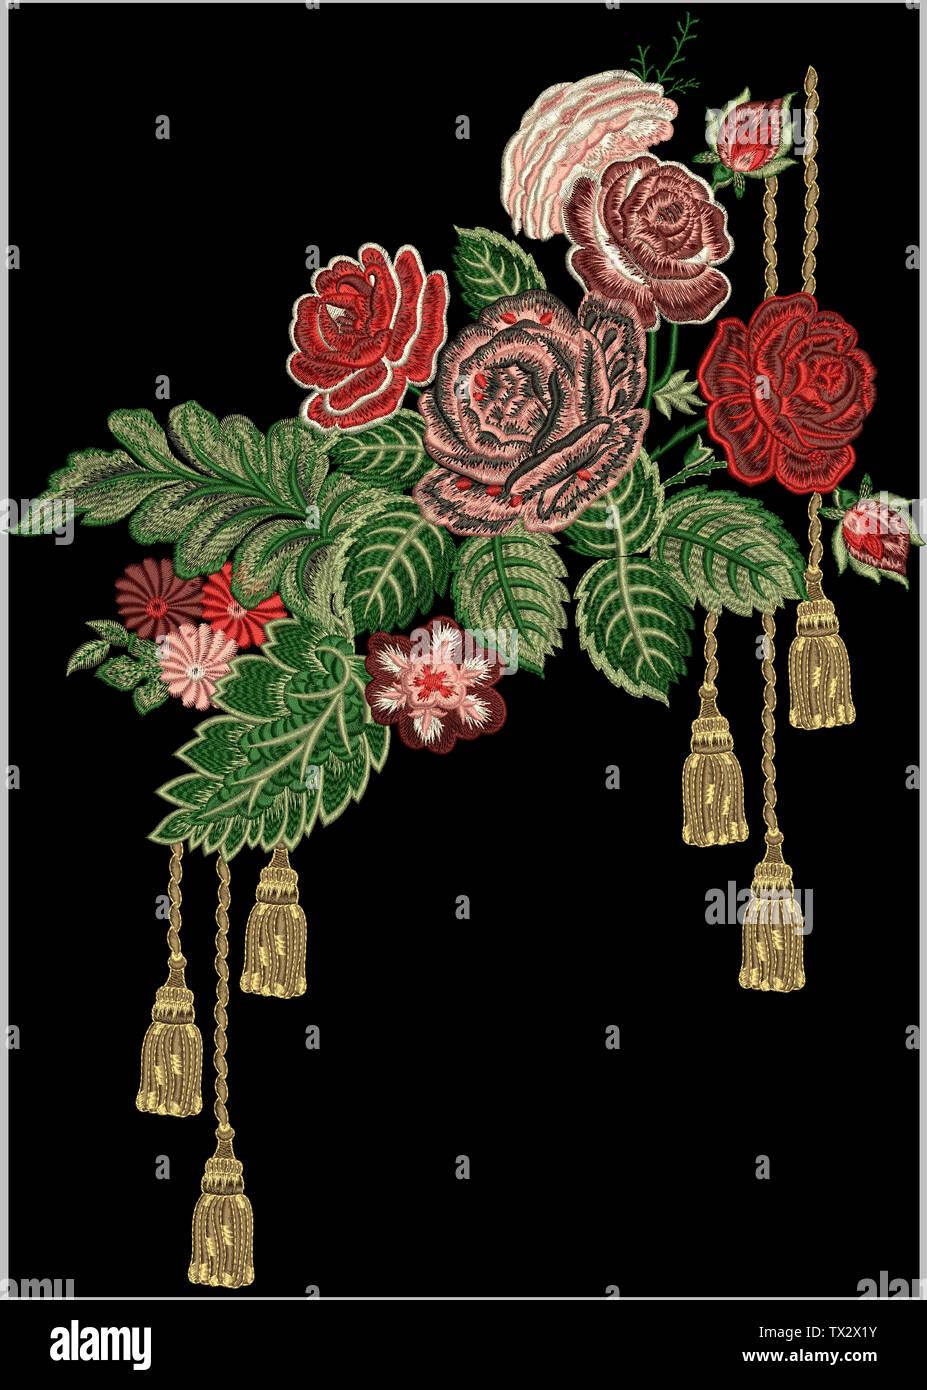 Textile Print Mughal Art miniature manual illustrated artwork Stock Photo